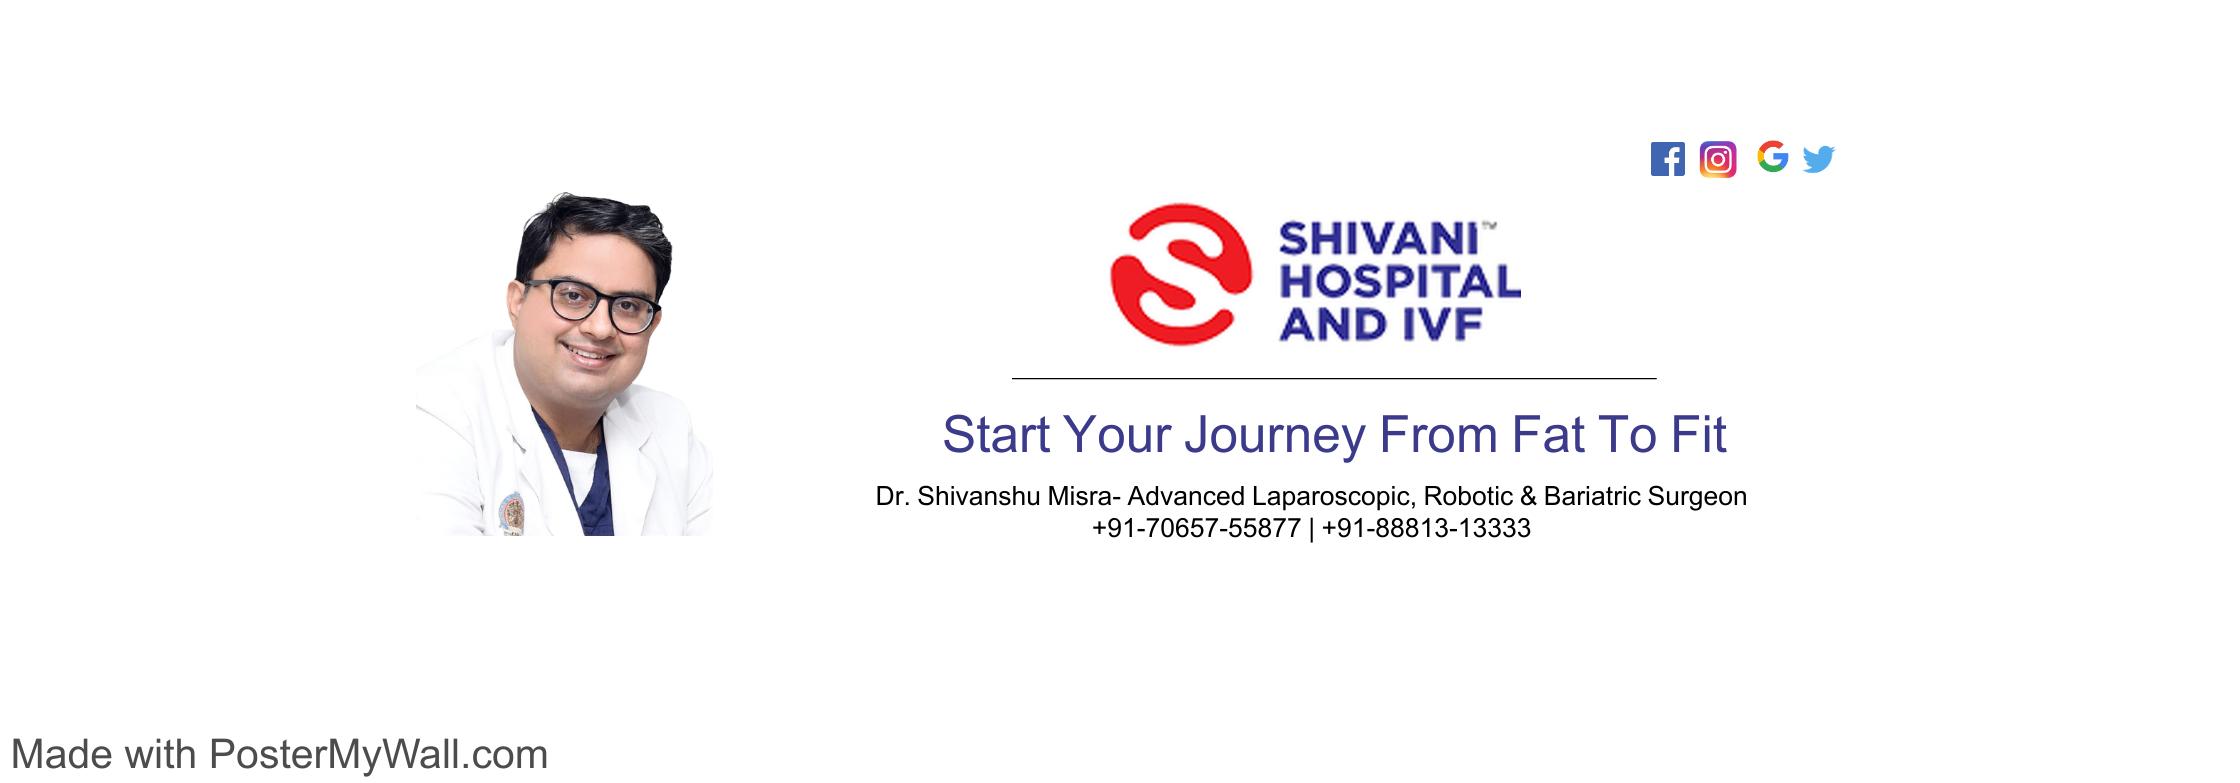 dr shivanshu misra